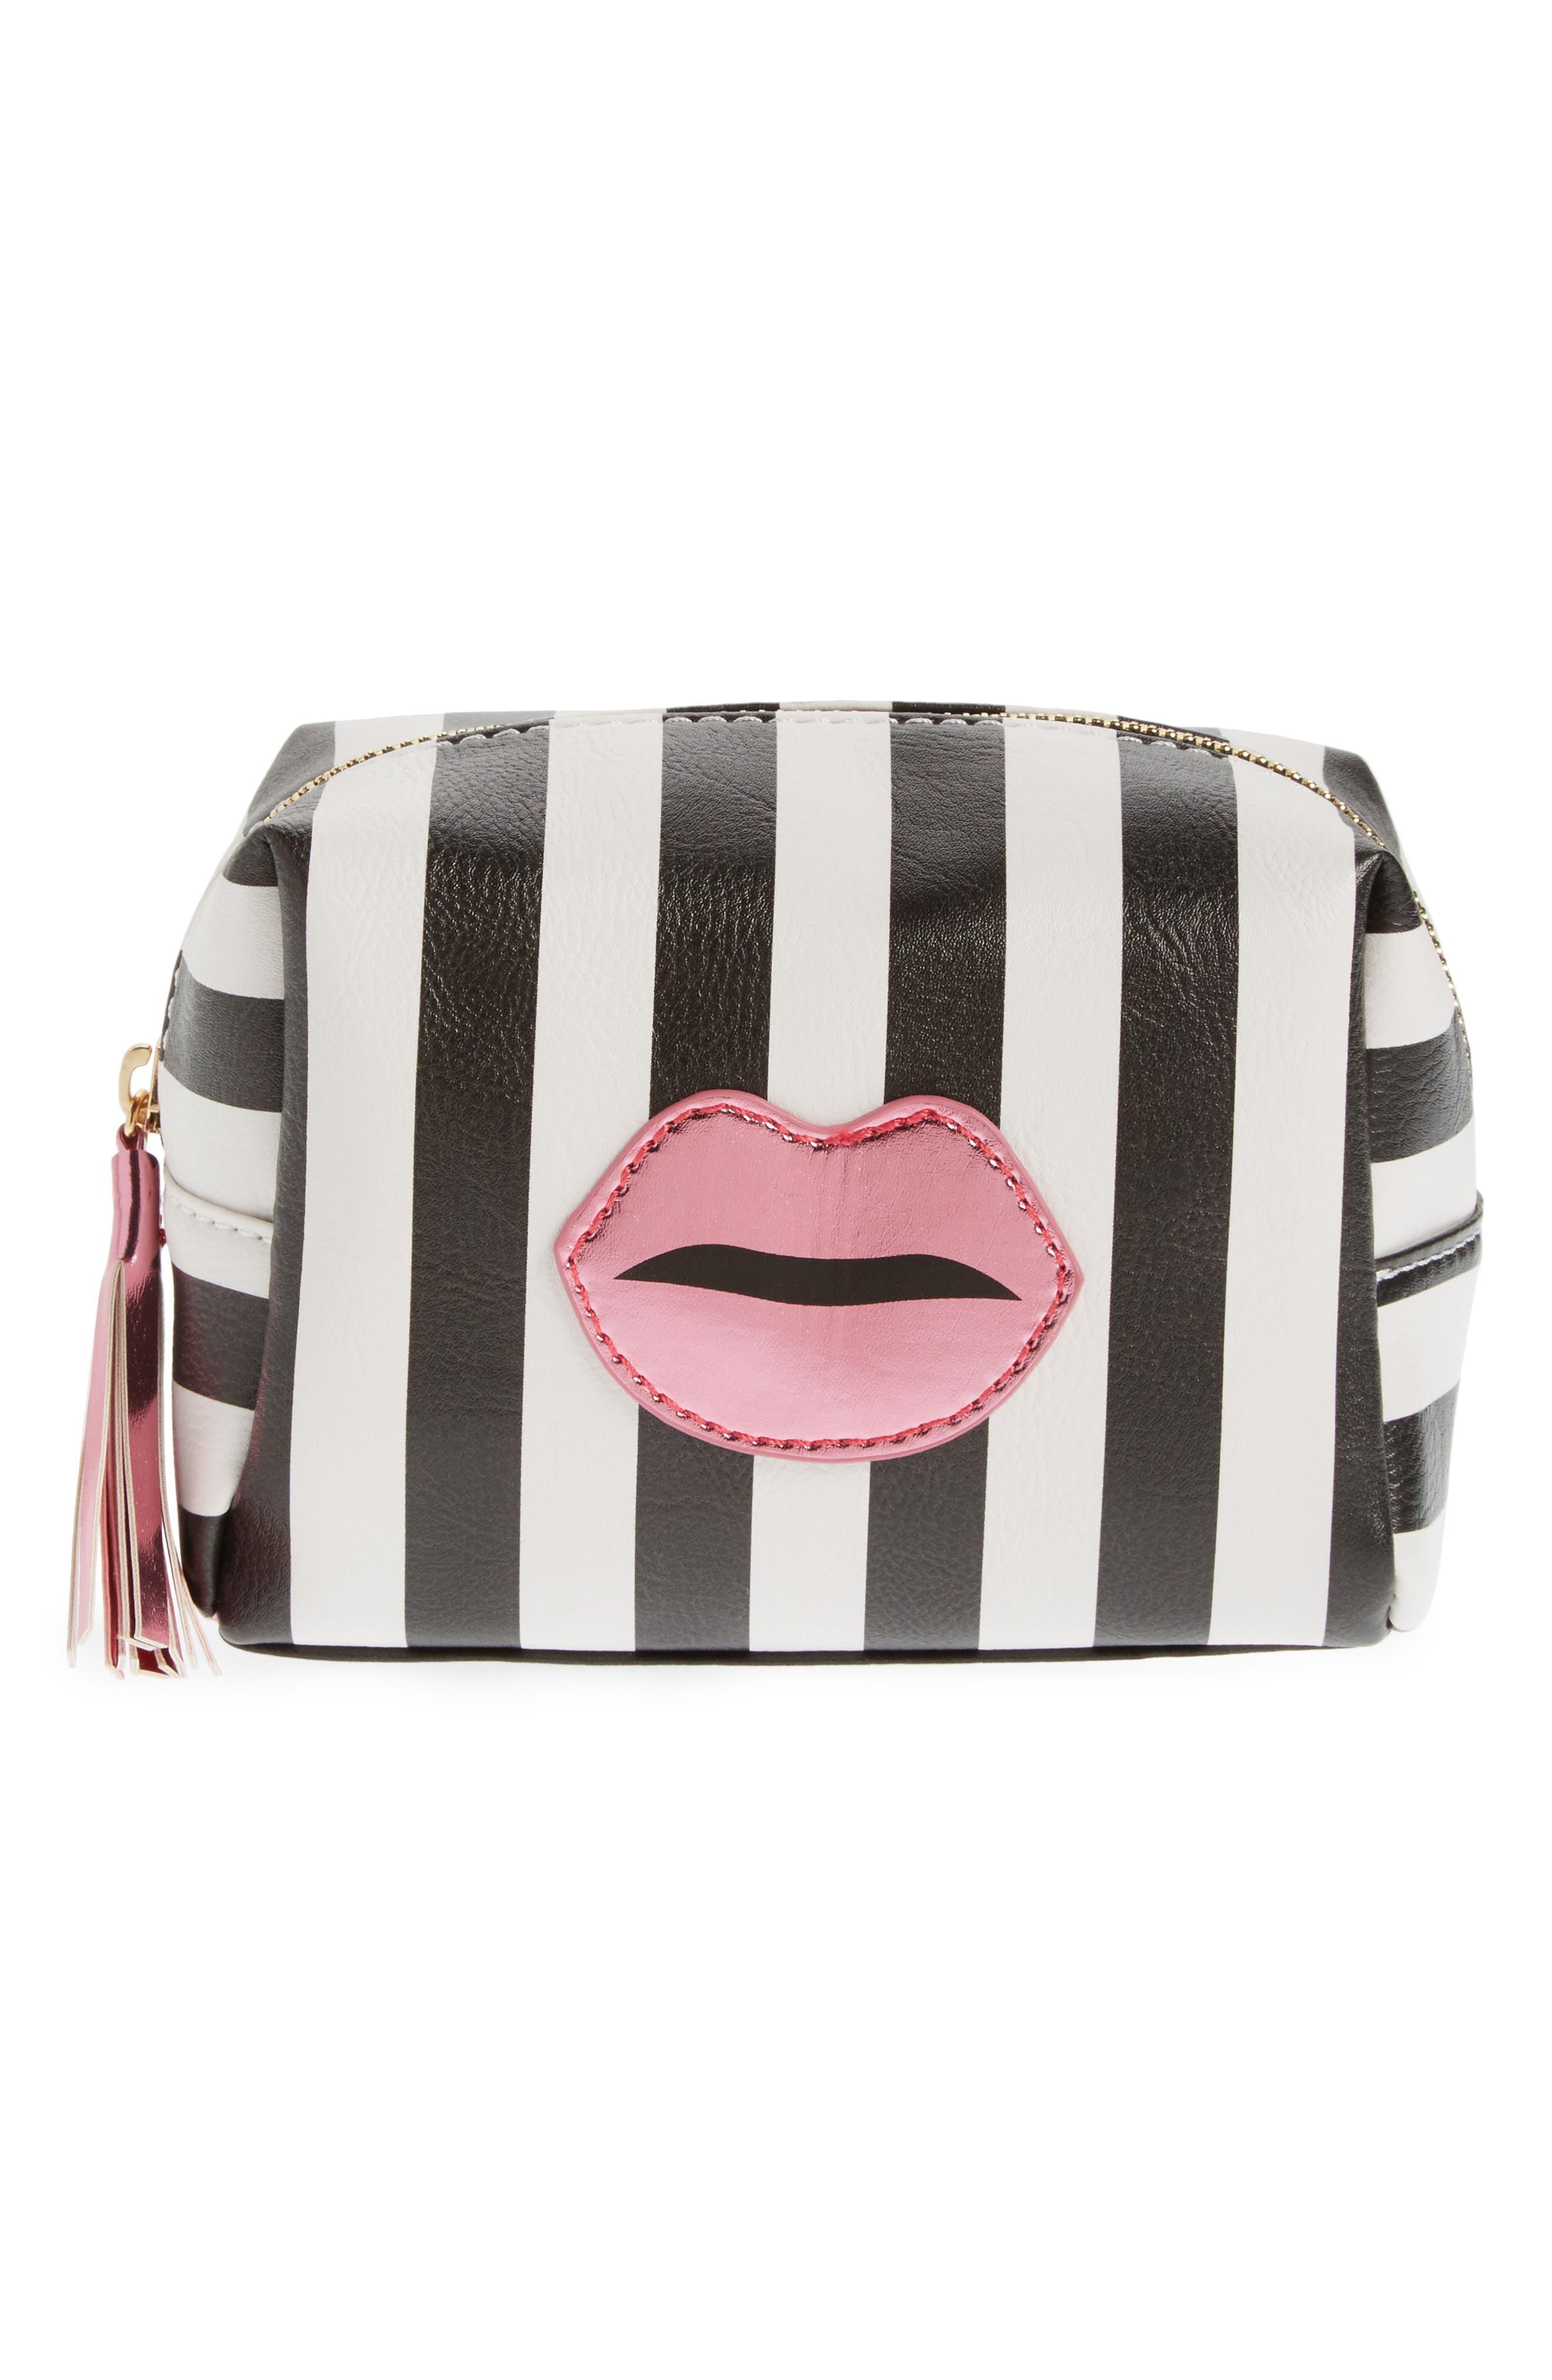 Alternate Image 1 Selected - OMG Metallic Lip Stripe Cosmetics Bag